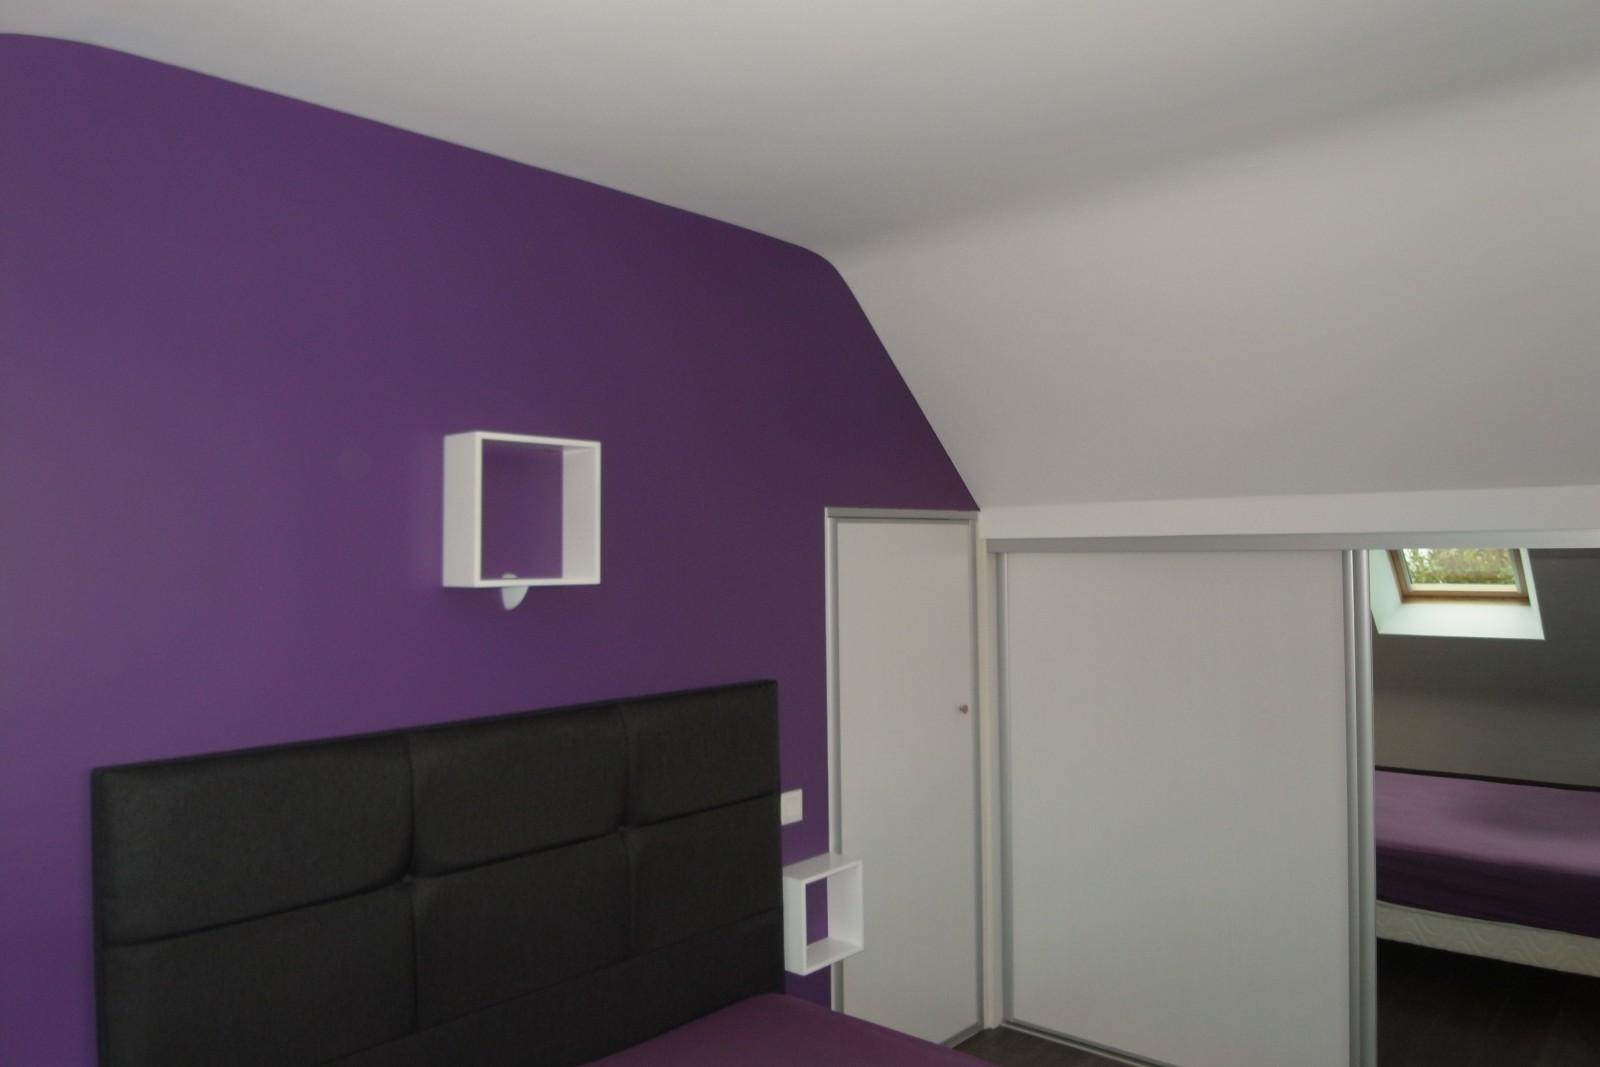 Chambre a coucher croco 063901 la - Peinture violette pour chambre ...